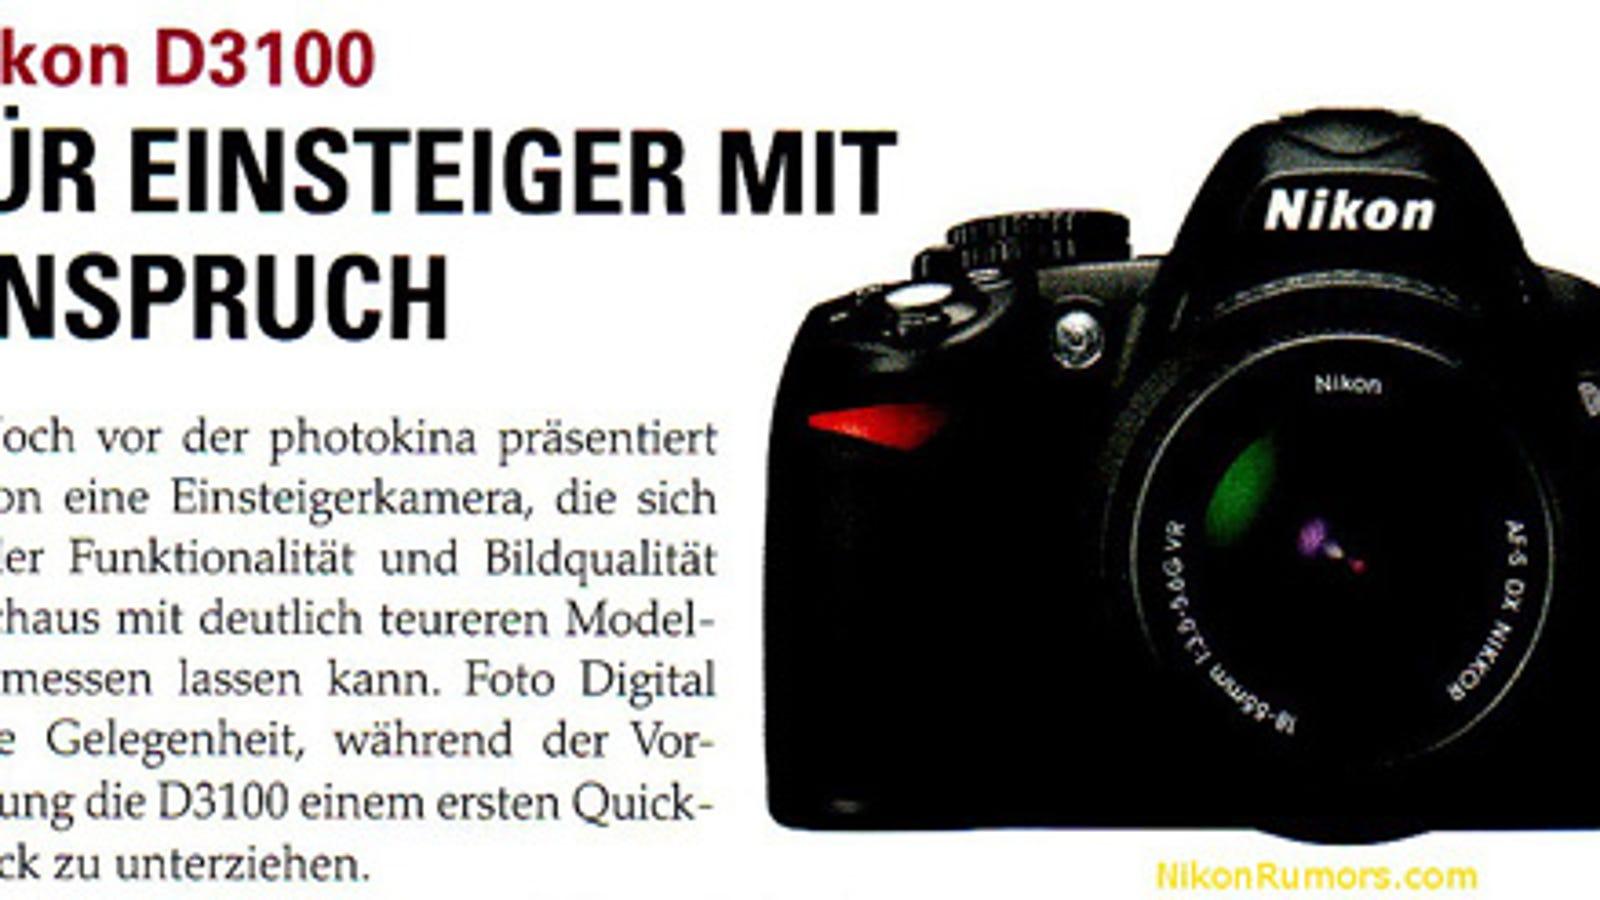 Nikon D3100 Leaked Details Reveal a 14 Megapixel CMOS Sensor and